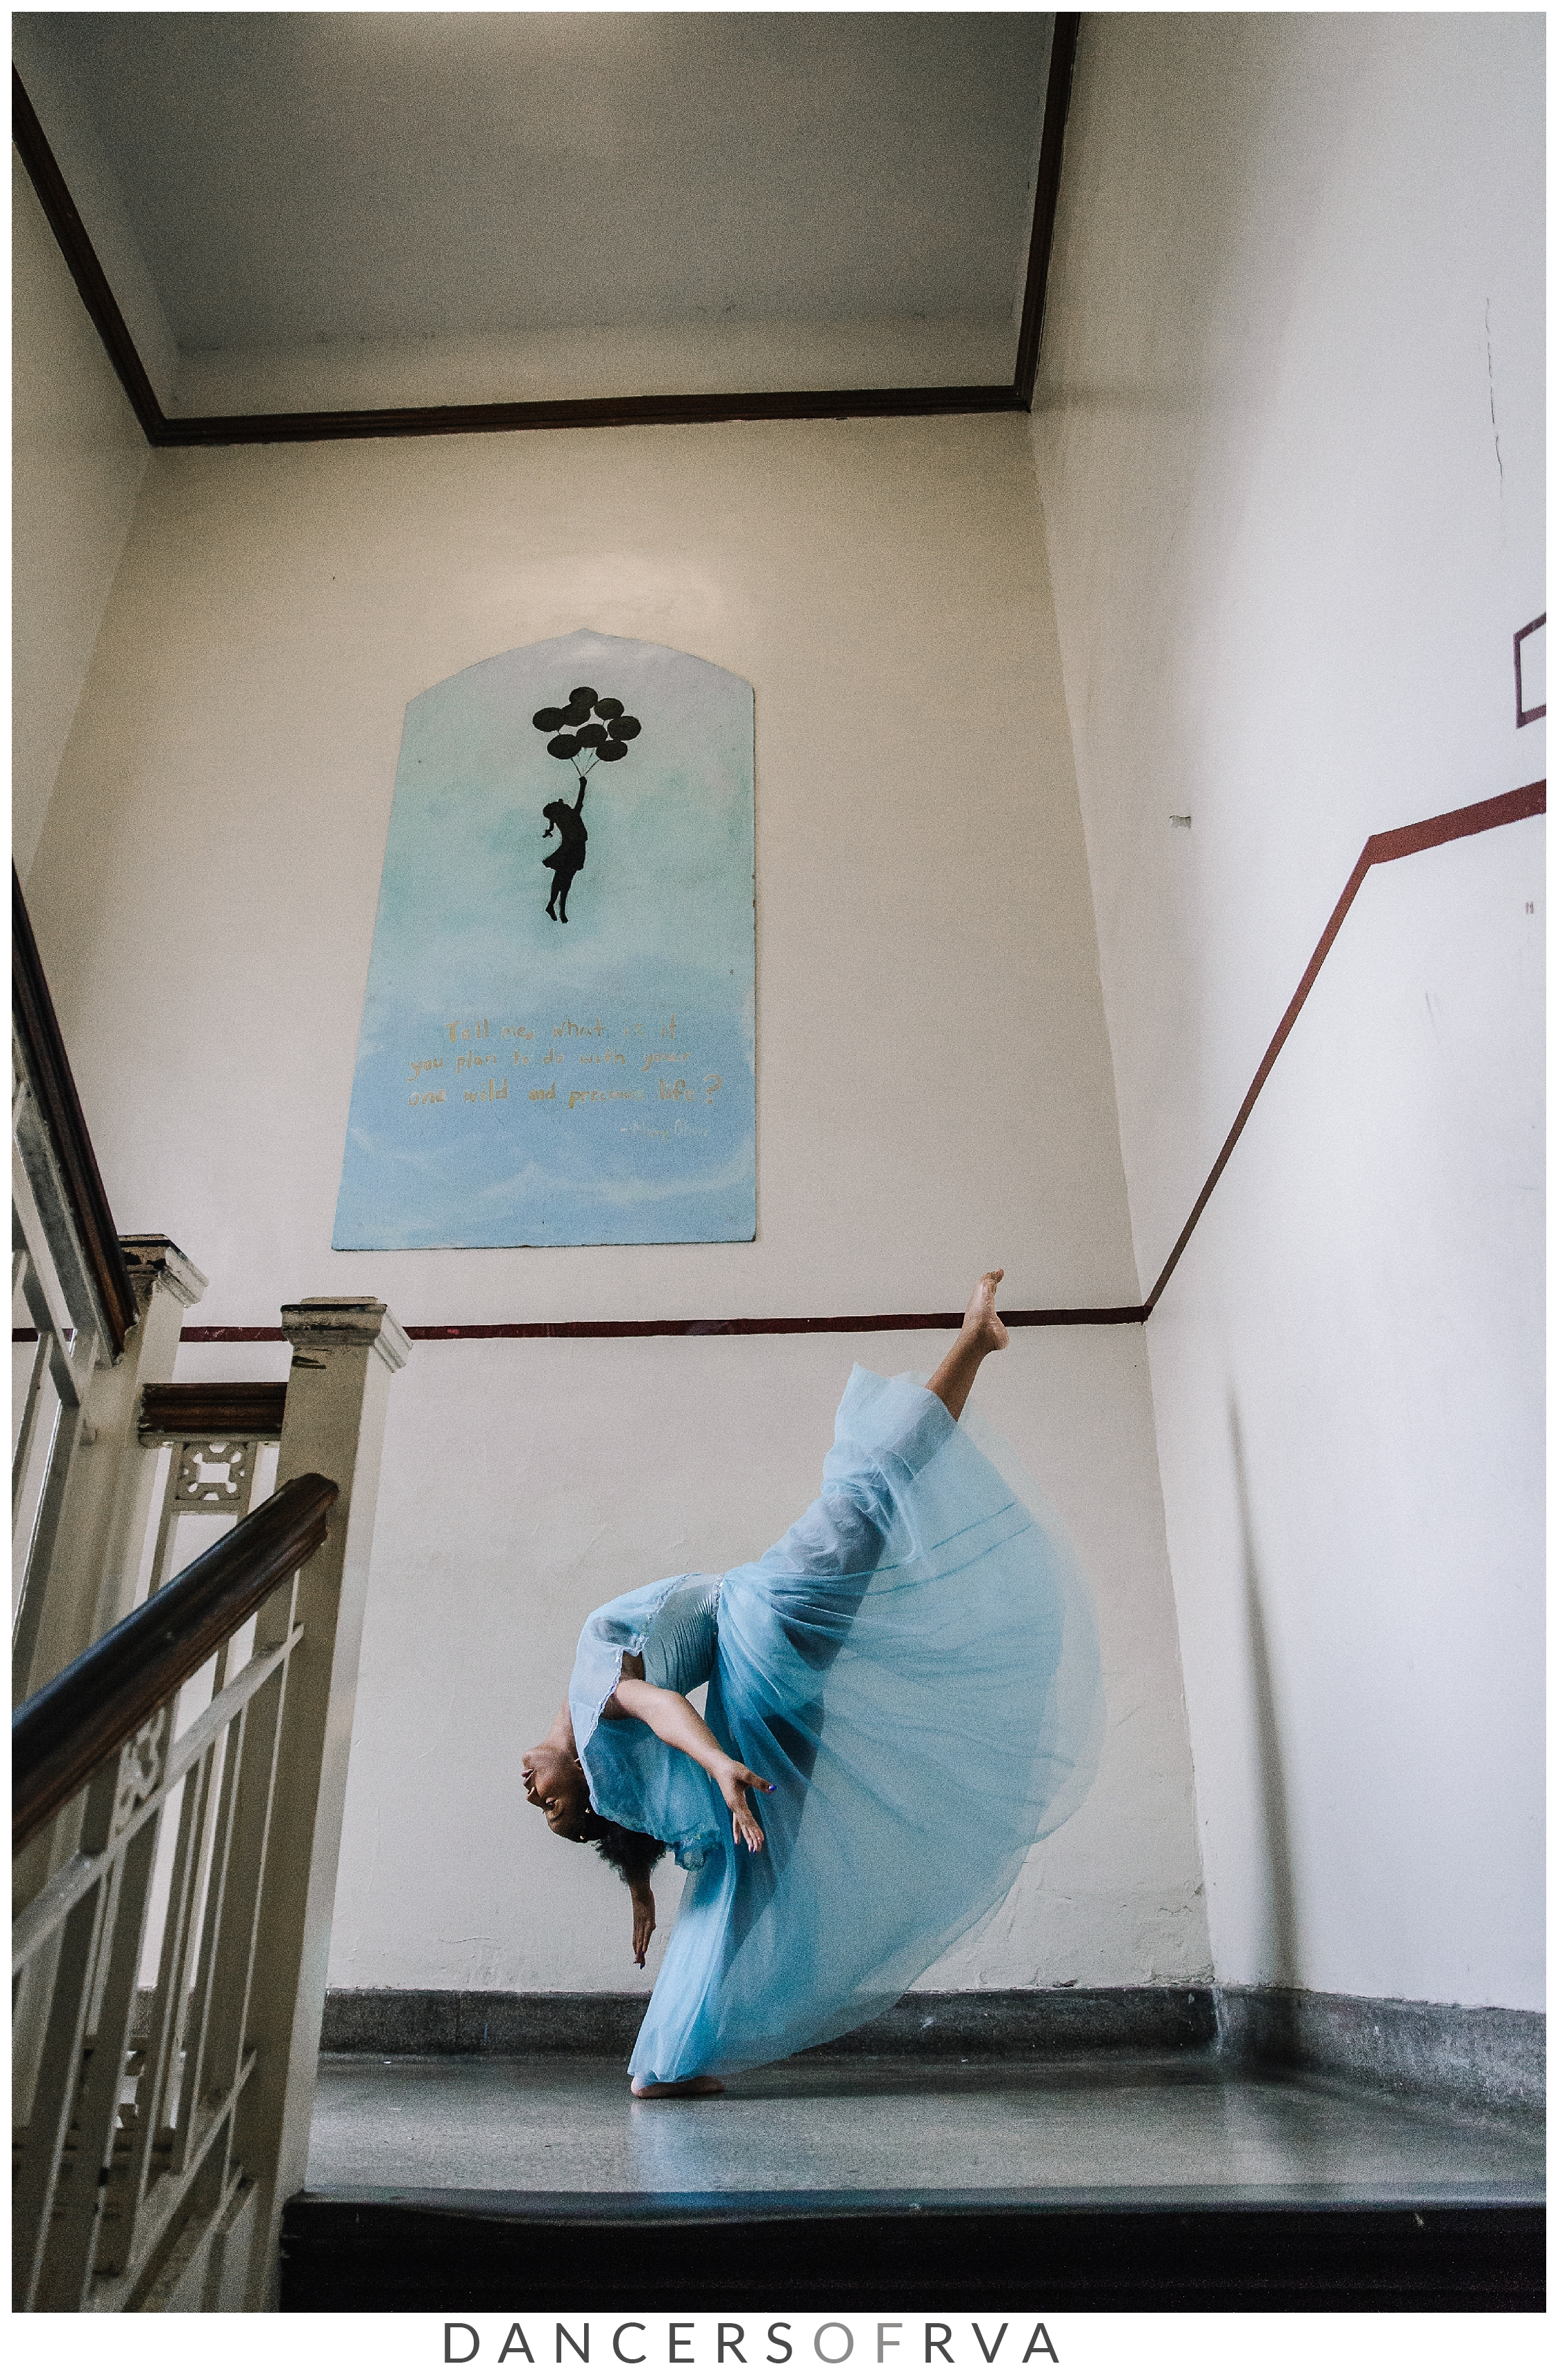 Richmond-Dance-Project-Binford-Dance-Company-Dancers-of-RVA_0022.jpg